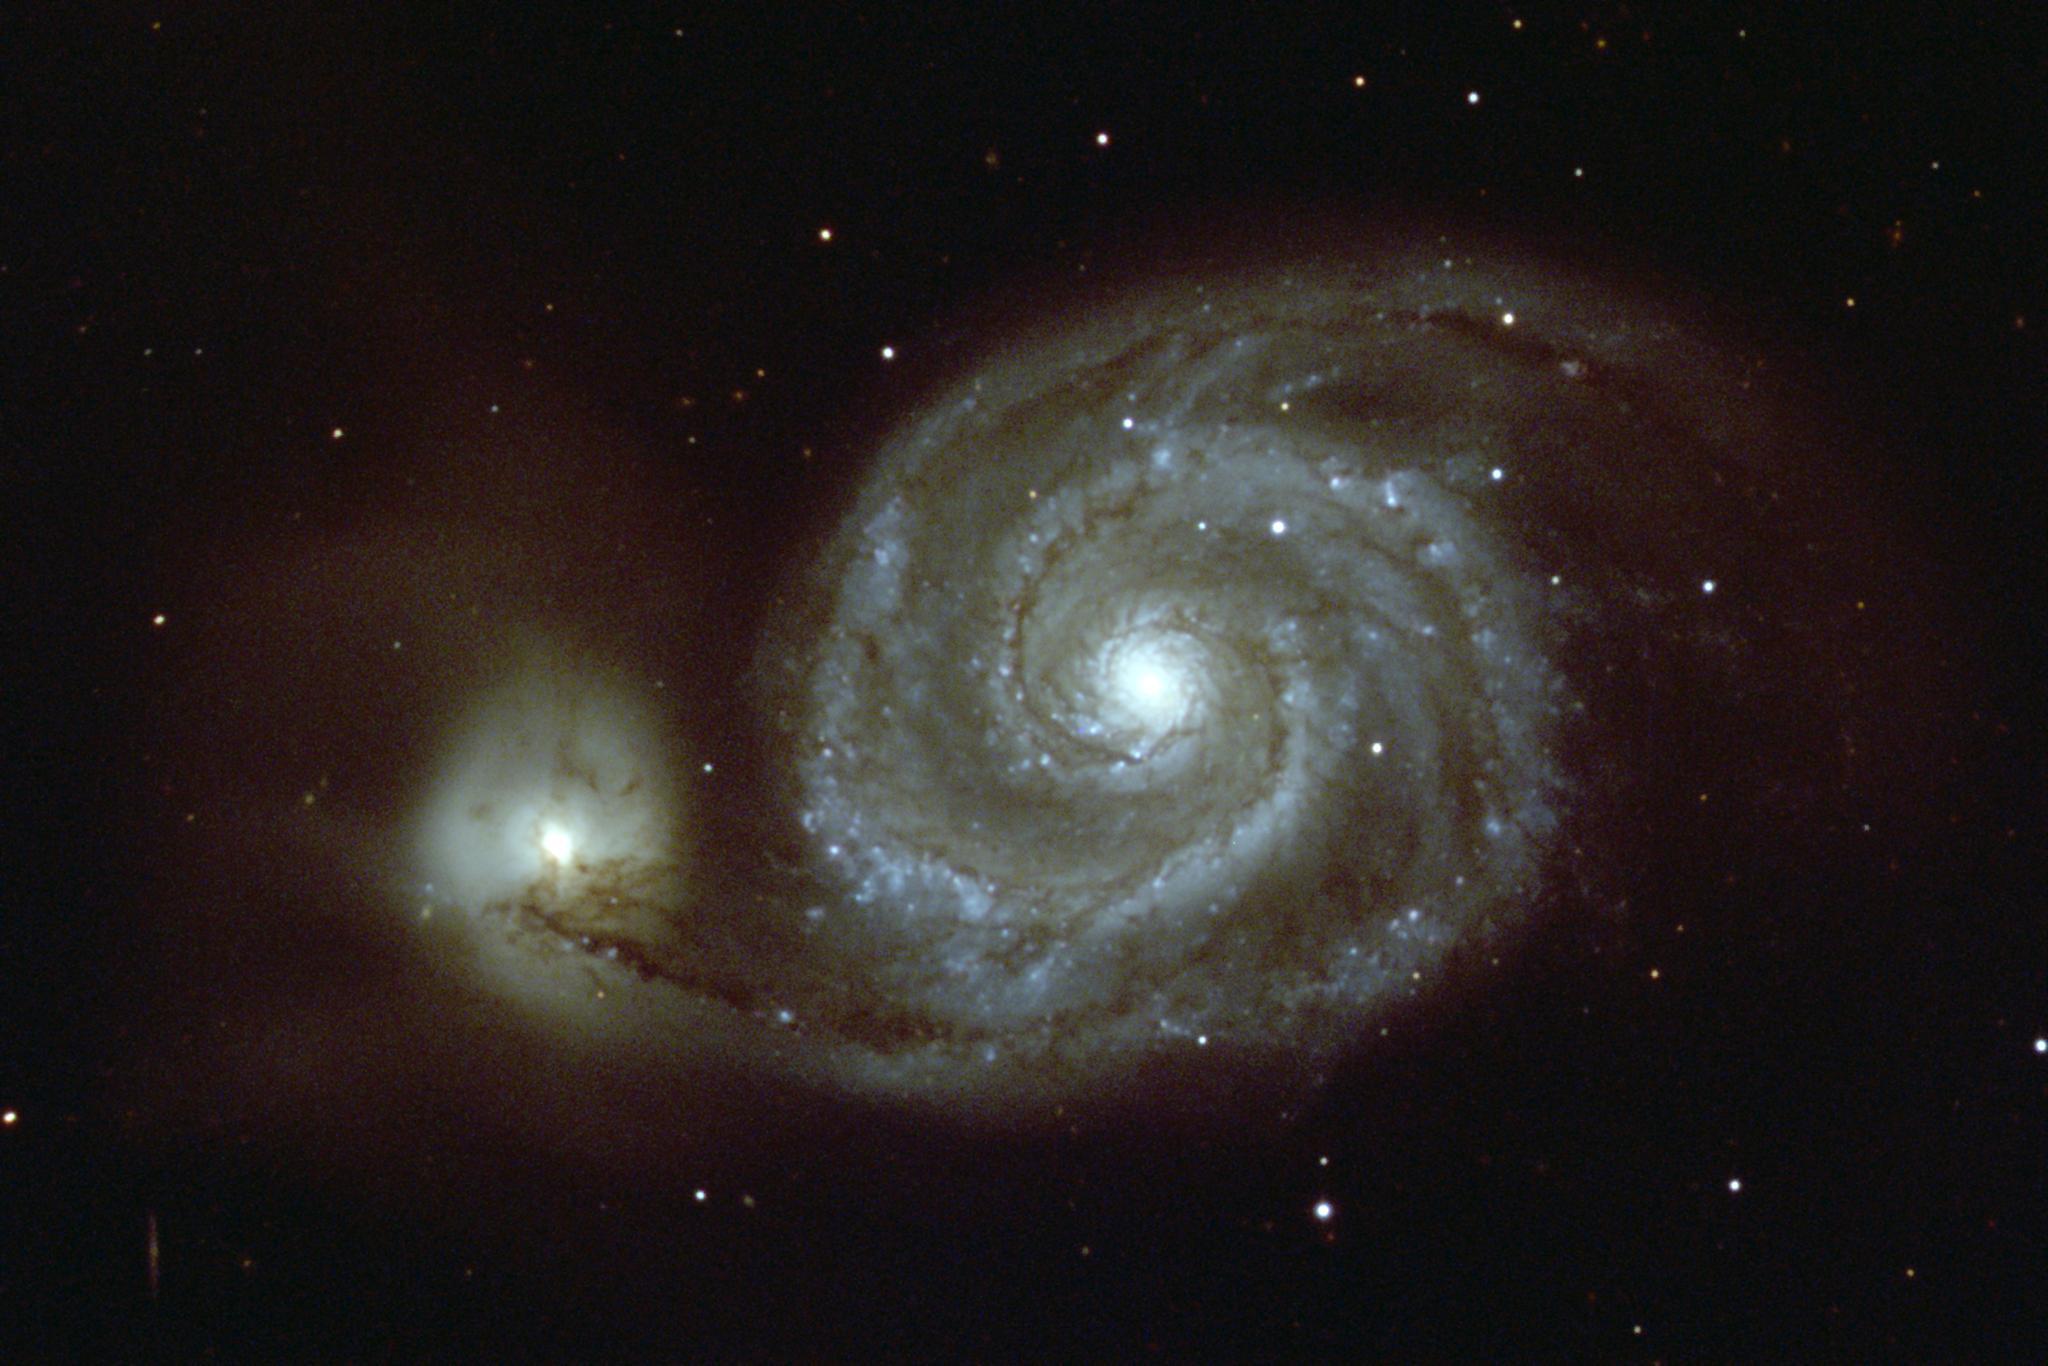 nasa whirlpool galaxy - photo #5